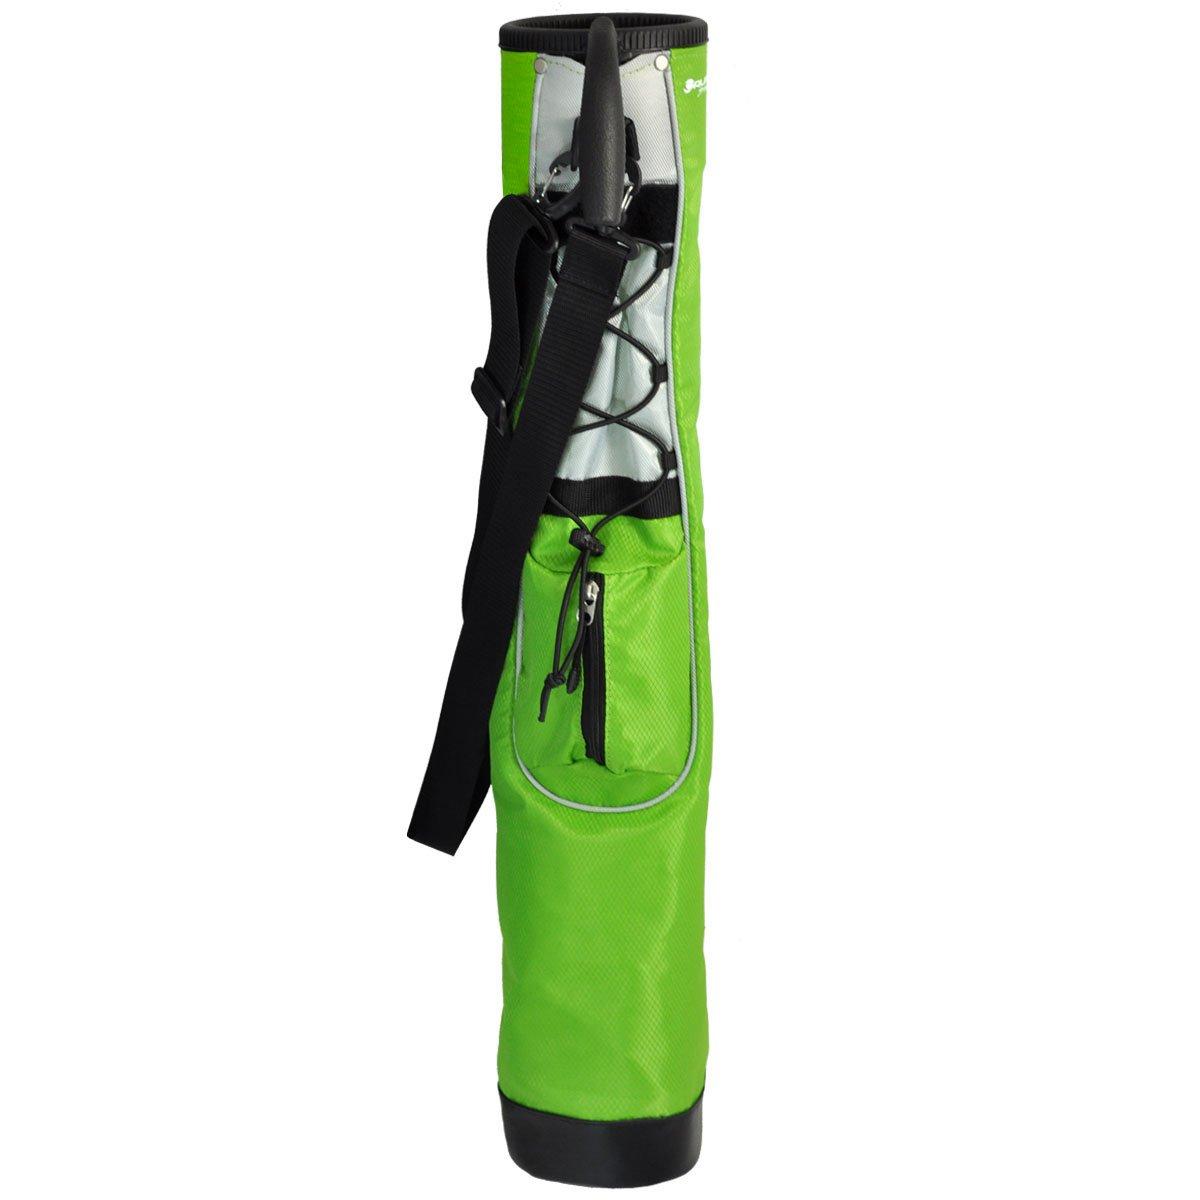 Amazon.com: Knight Pitch y Putt Golf Soporte ligero bolsa de ...